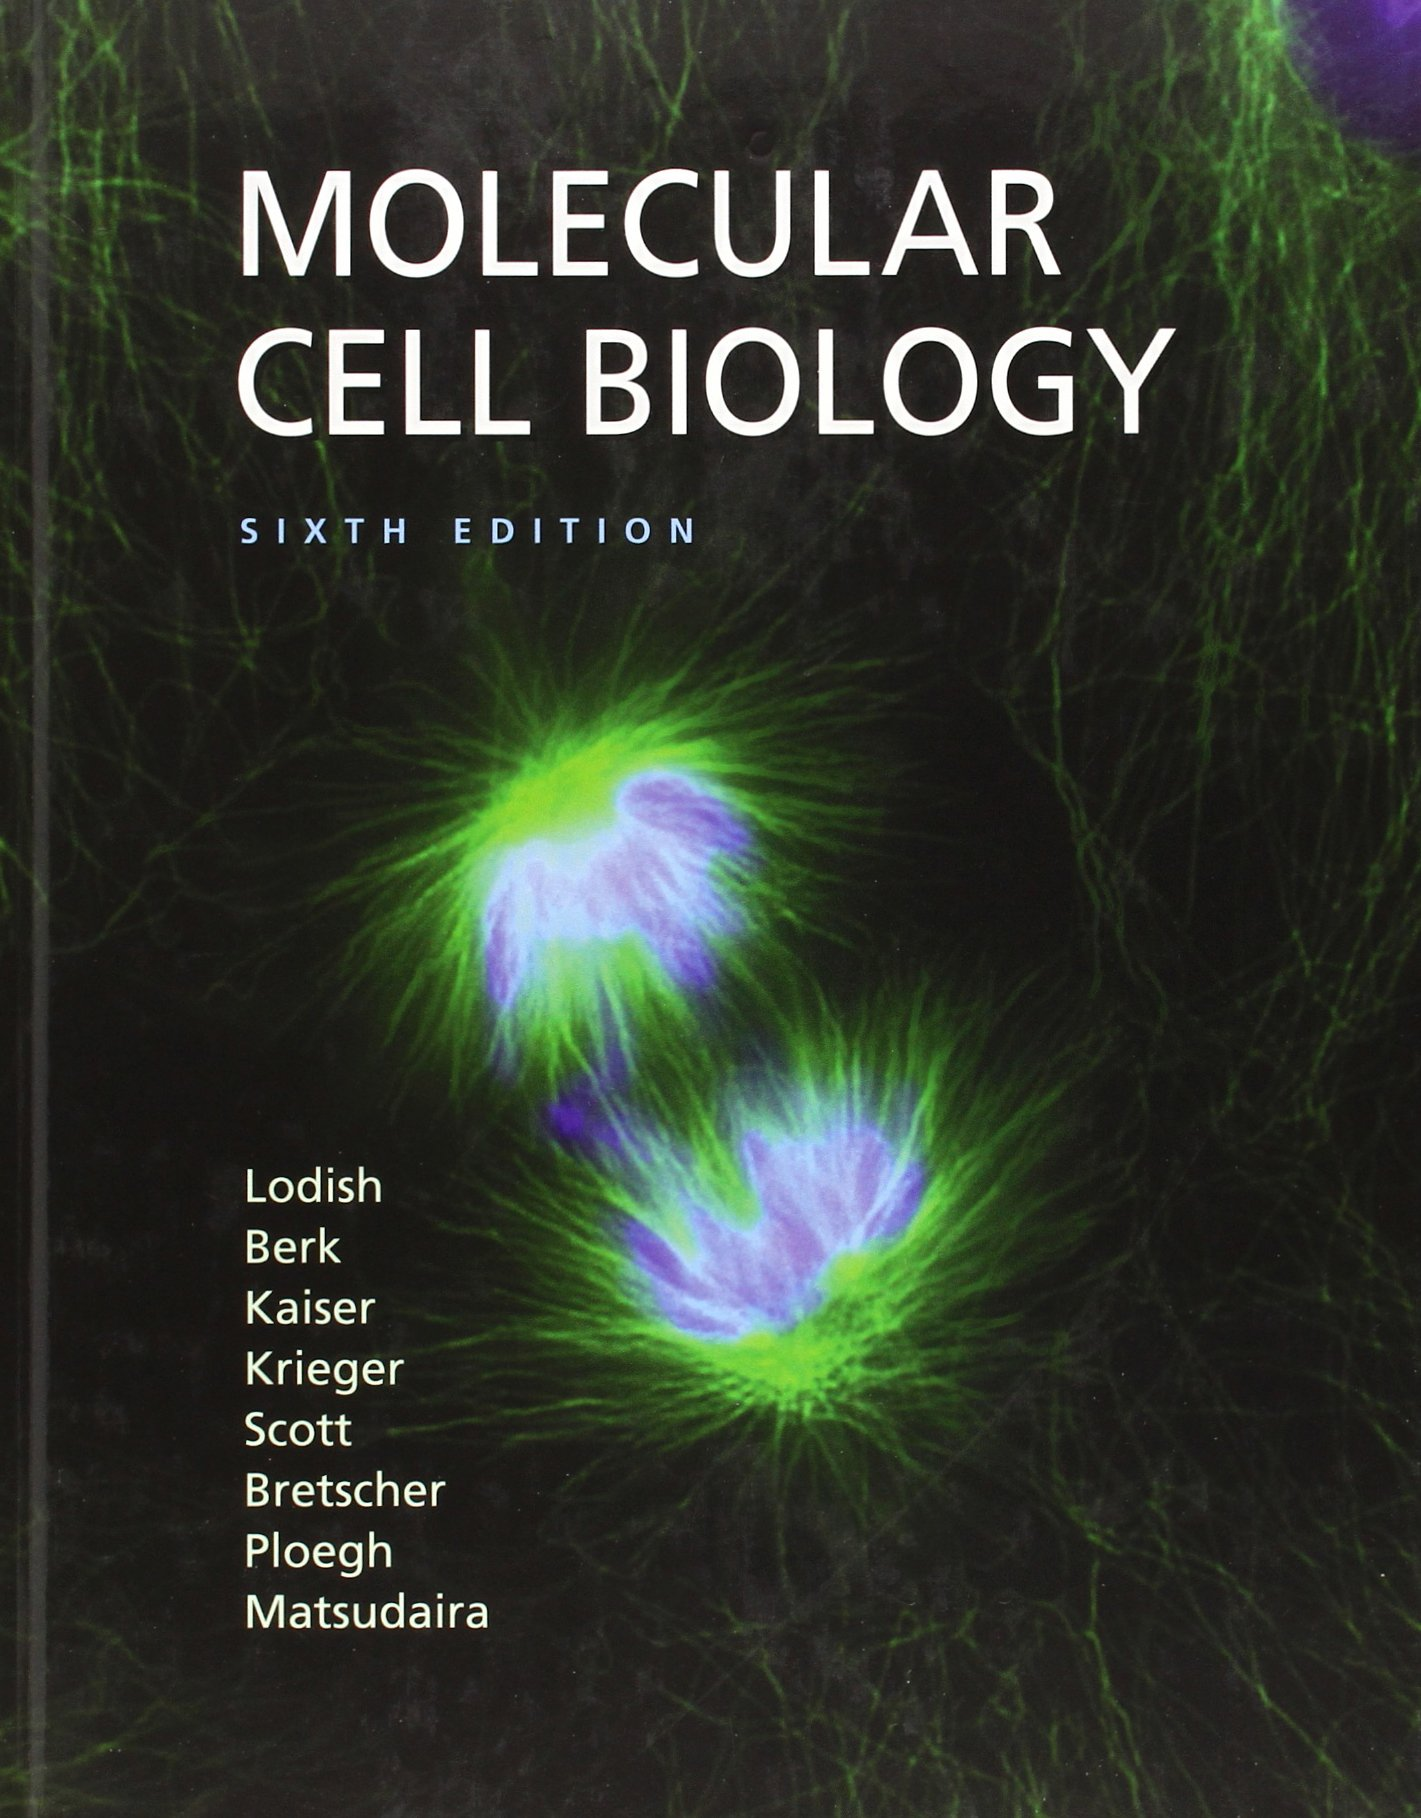 Molecular cell biology amazon harvey lodish arnold berk molecular cell biology amazon harvey lodish arnold berk chris a kaiser 8601419594429 books fandeluxe Image collections